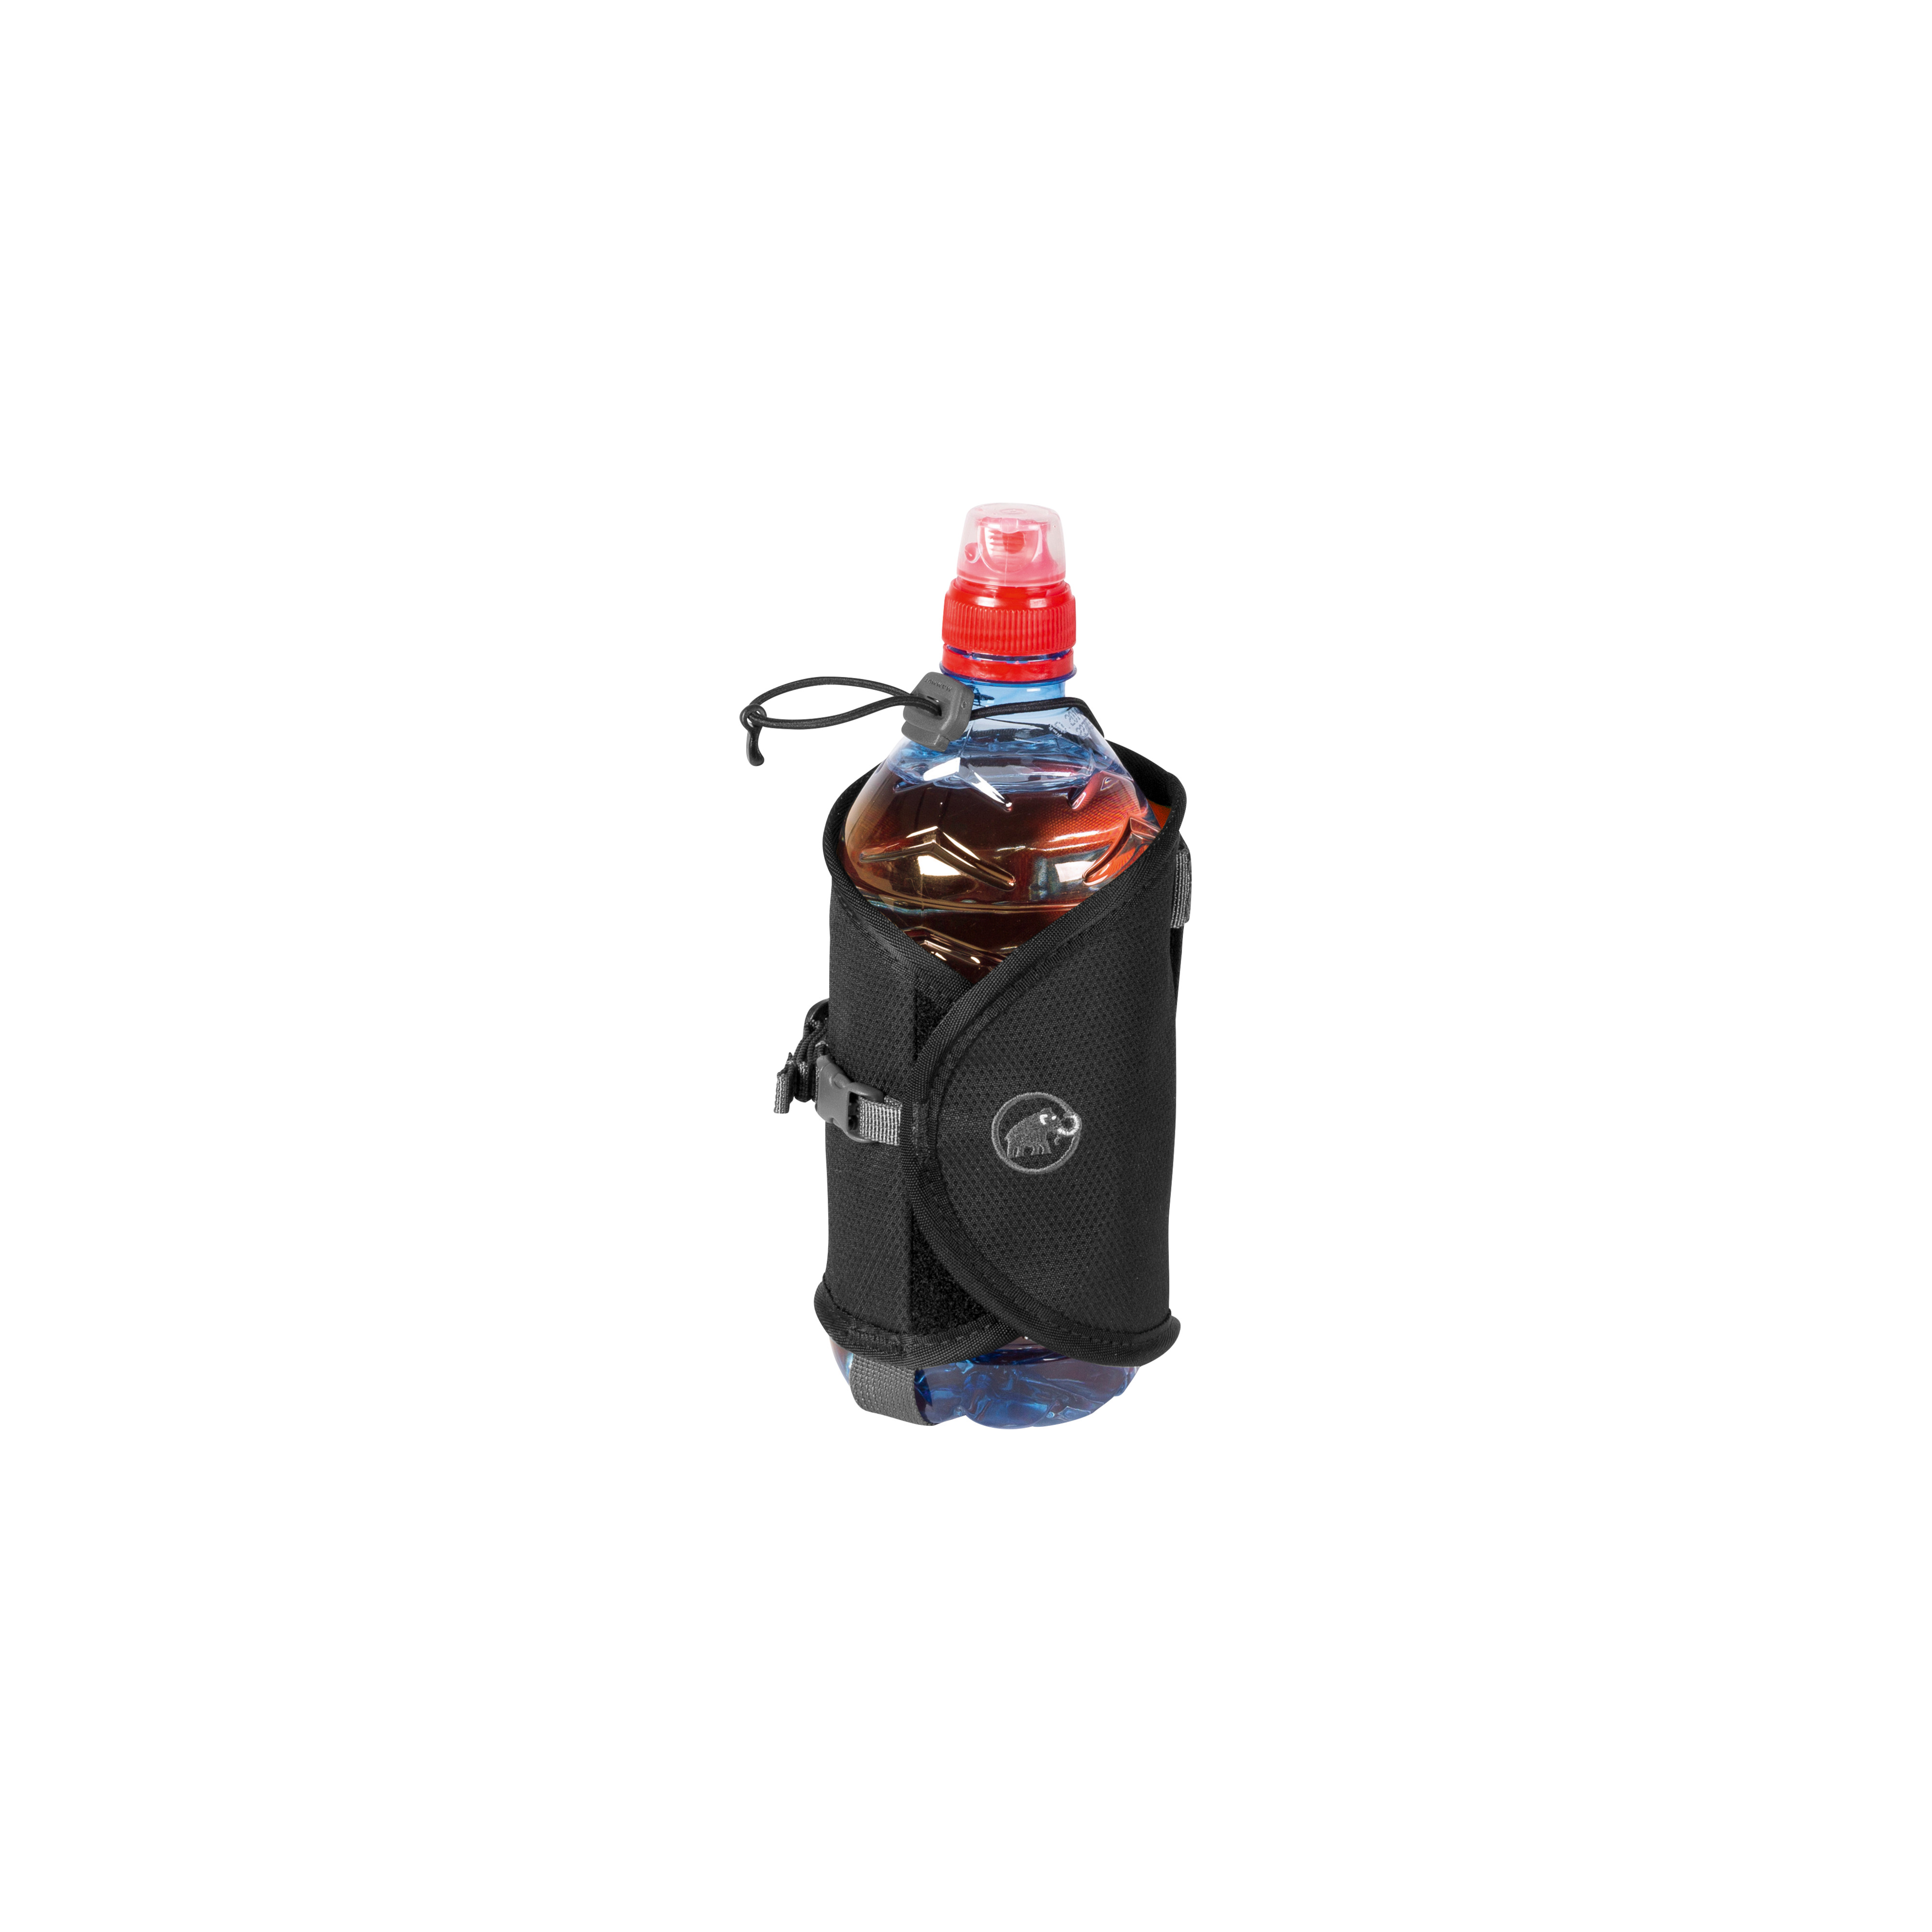 Add-on bottle holder - black, one size thumbnail